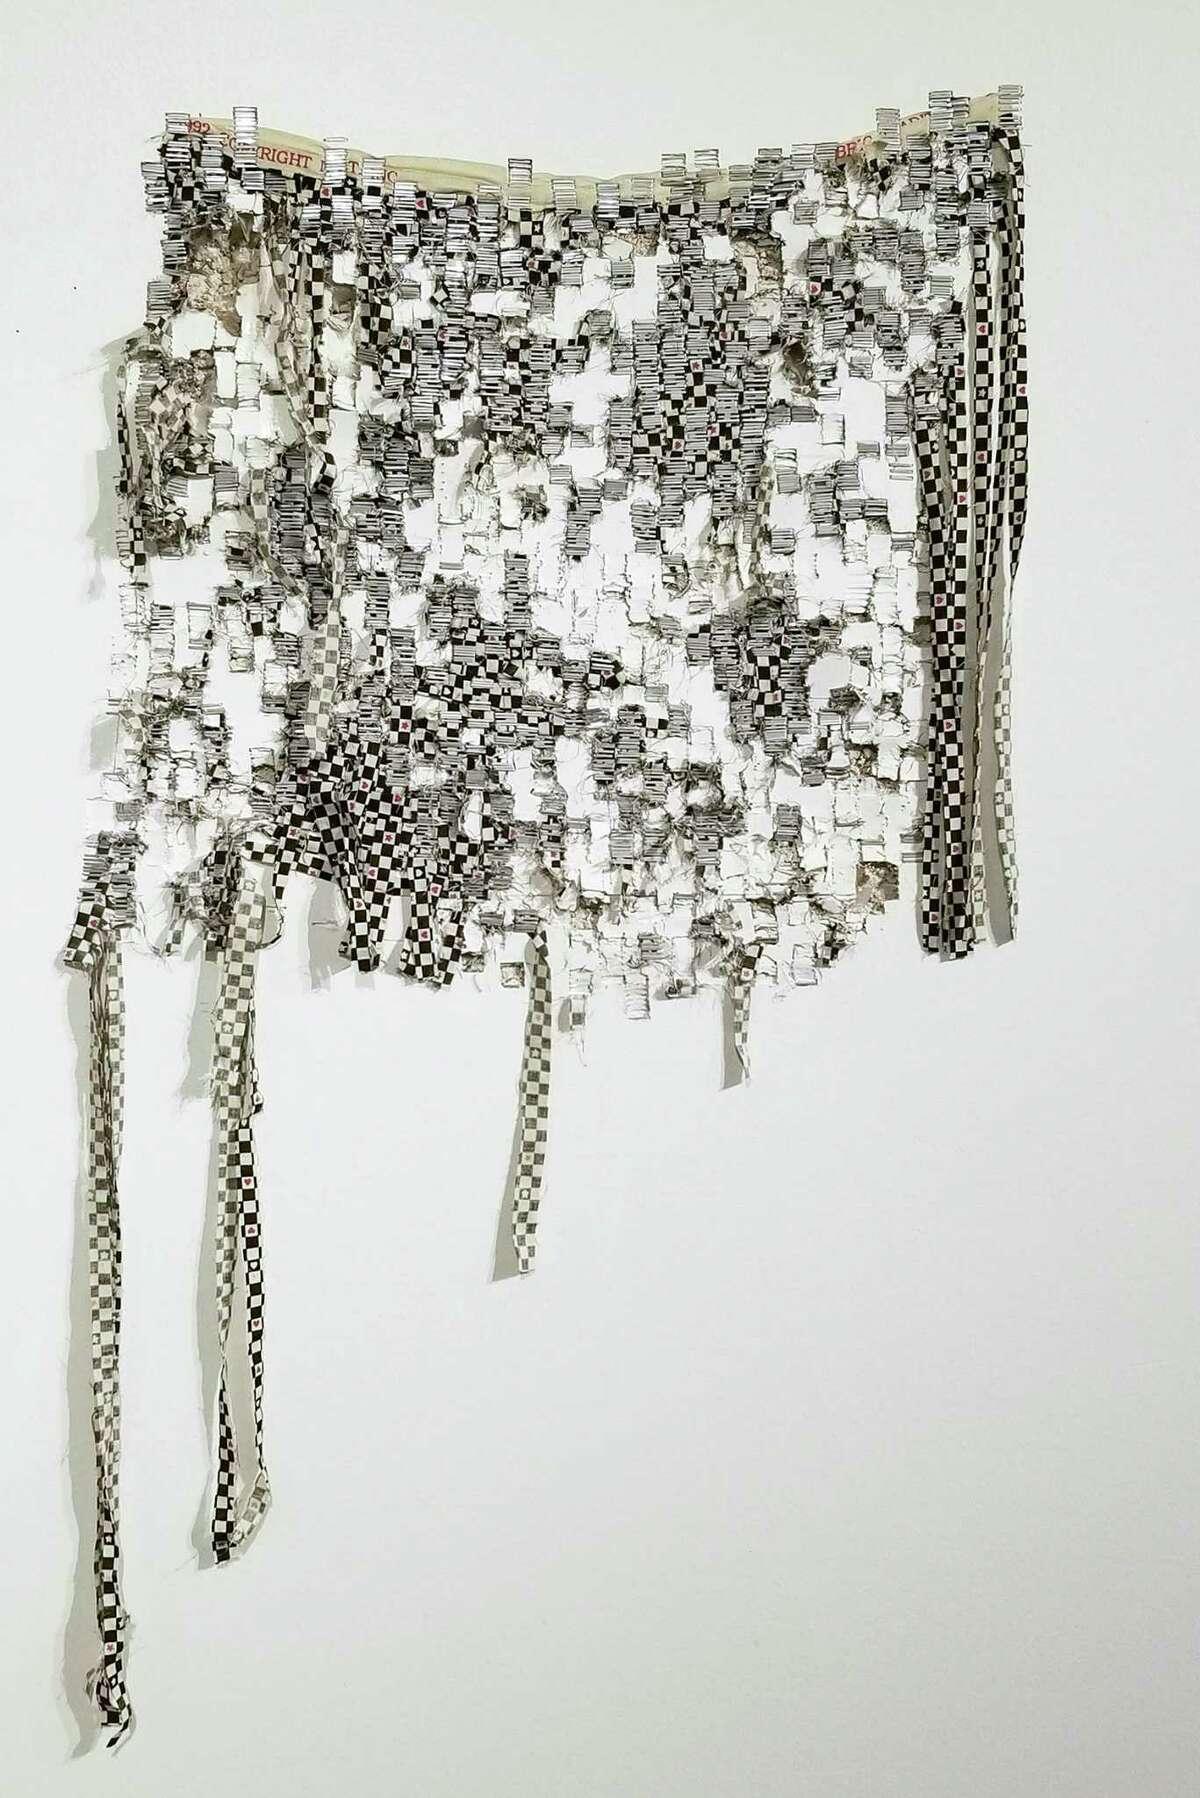 Elana Herzog, Poltergeist, 2019. Metal staples, pencil, textile in drywall, silicone caulk. (Airport Gallery)